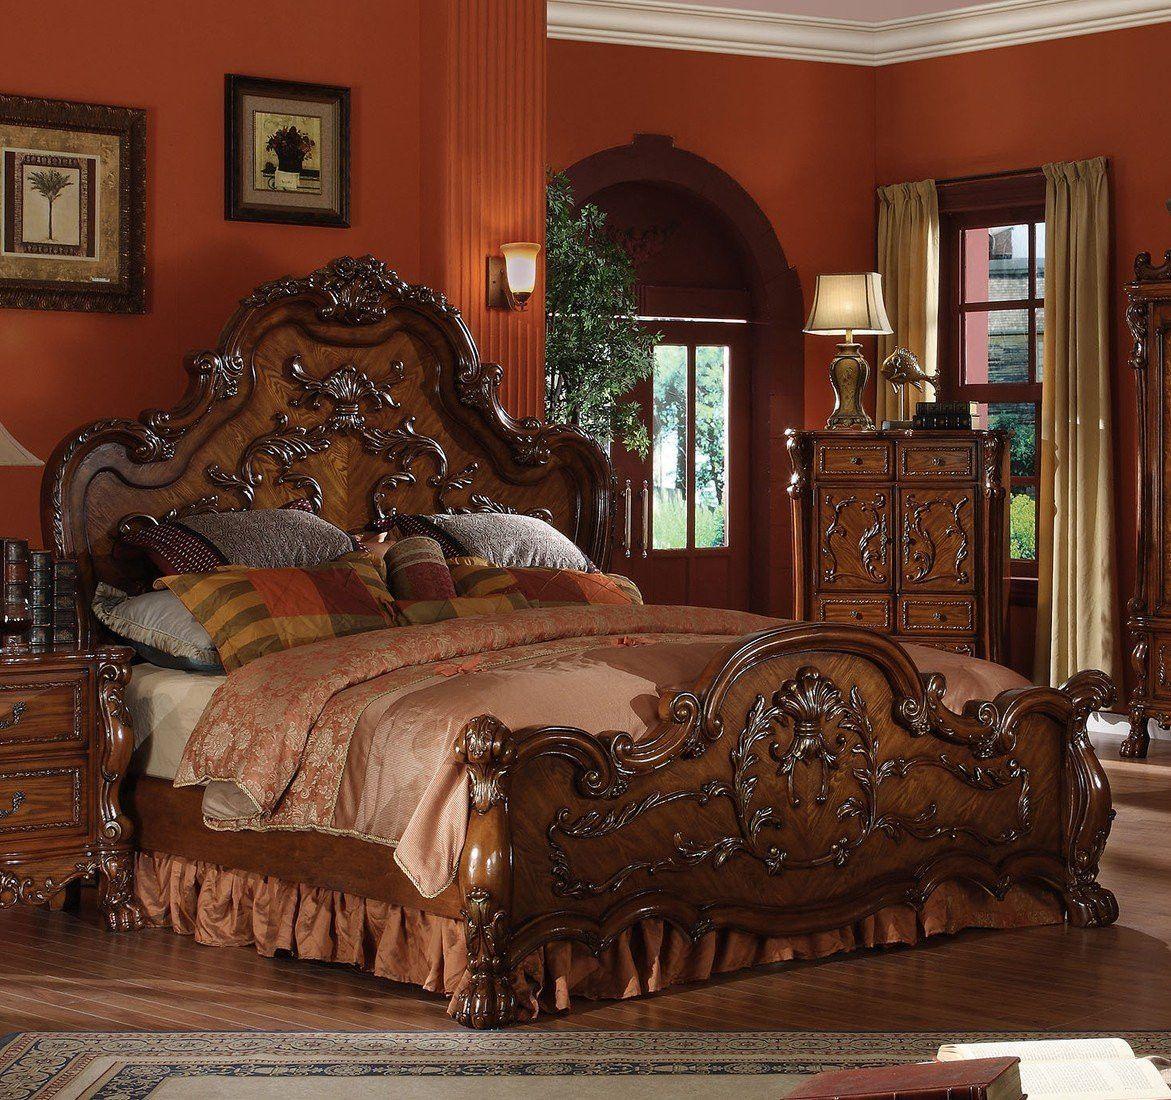 ACME Dresden Queen Bed Cherry Oak - 12140Q | Traditional ...